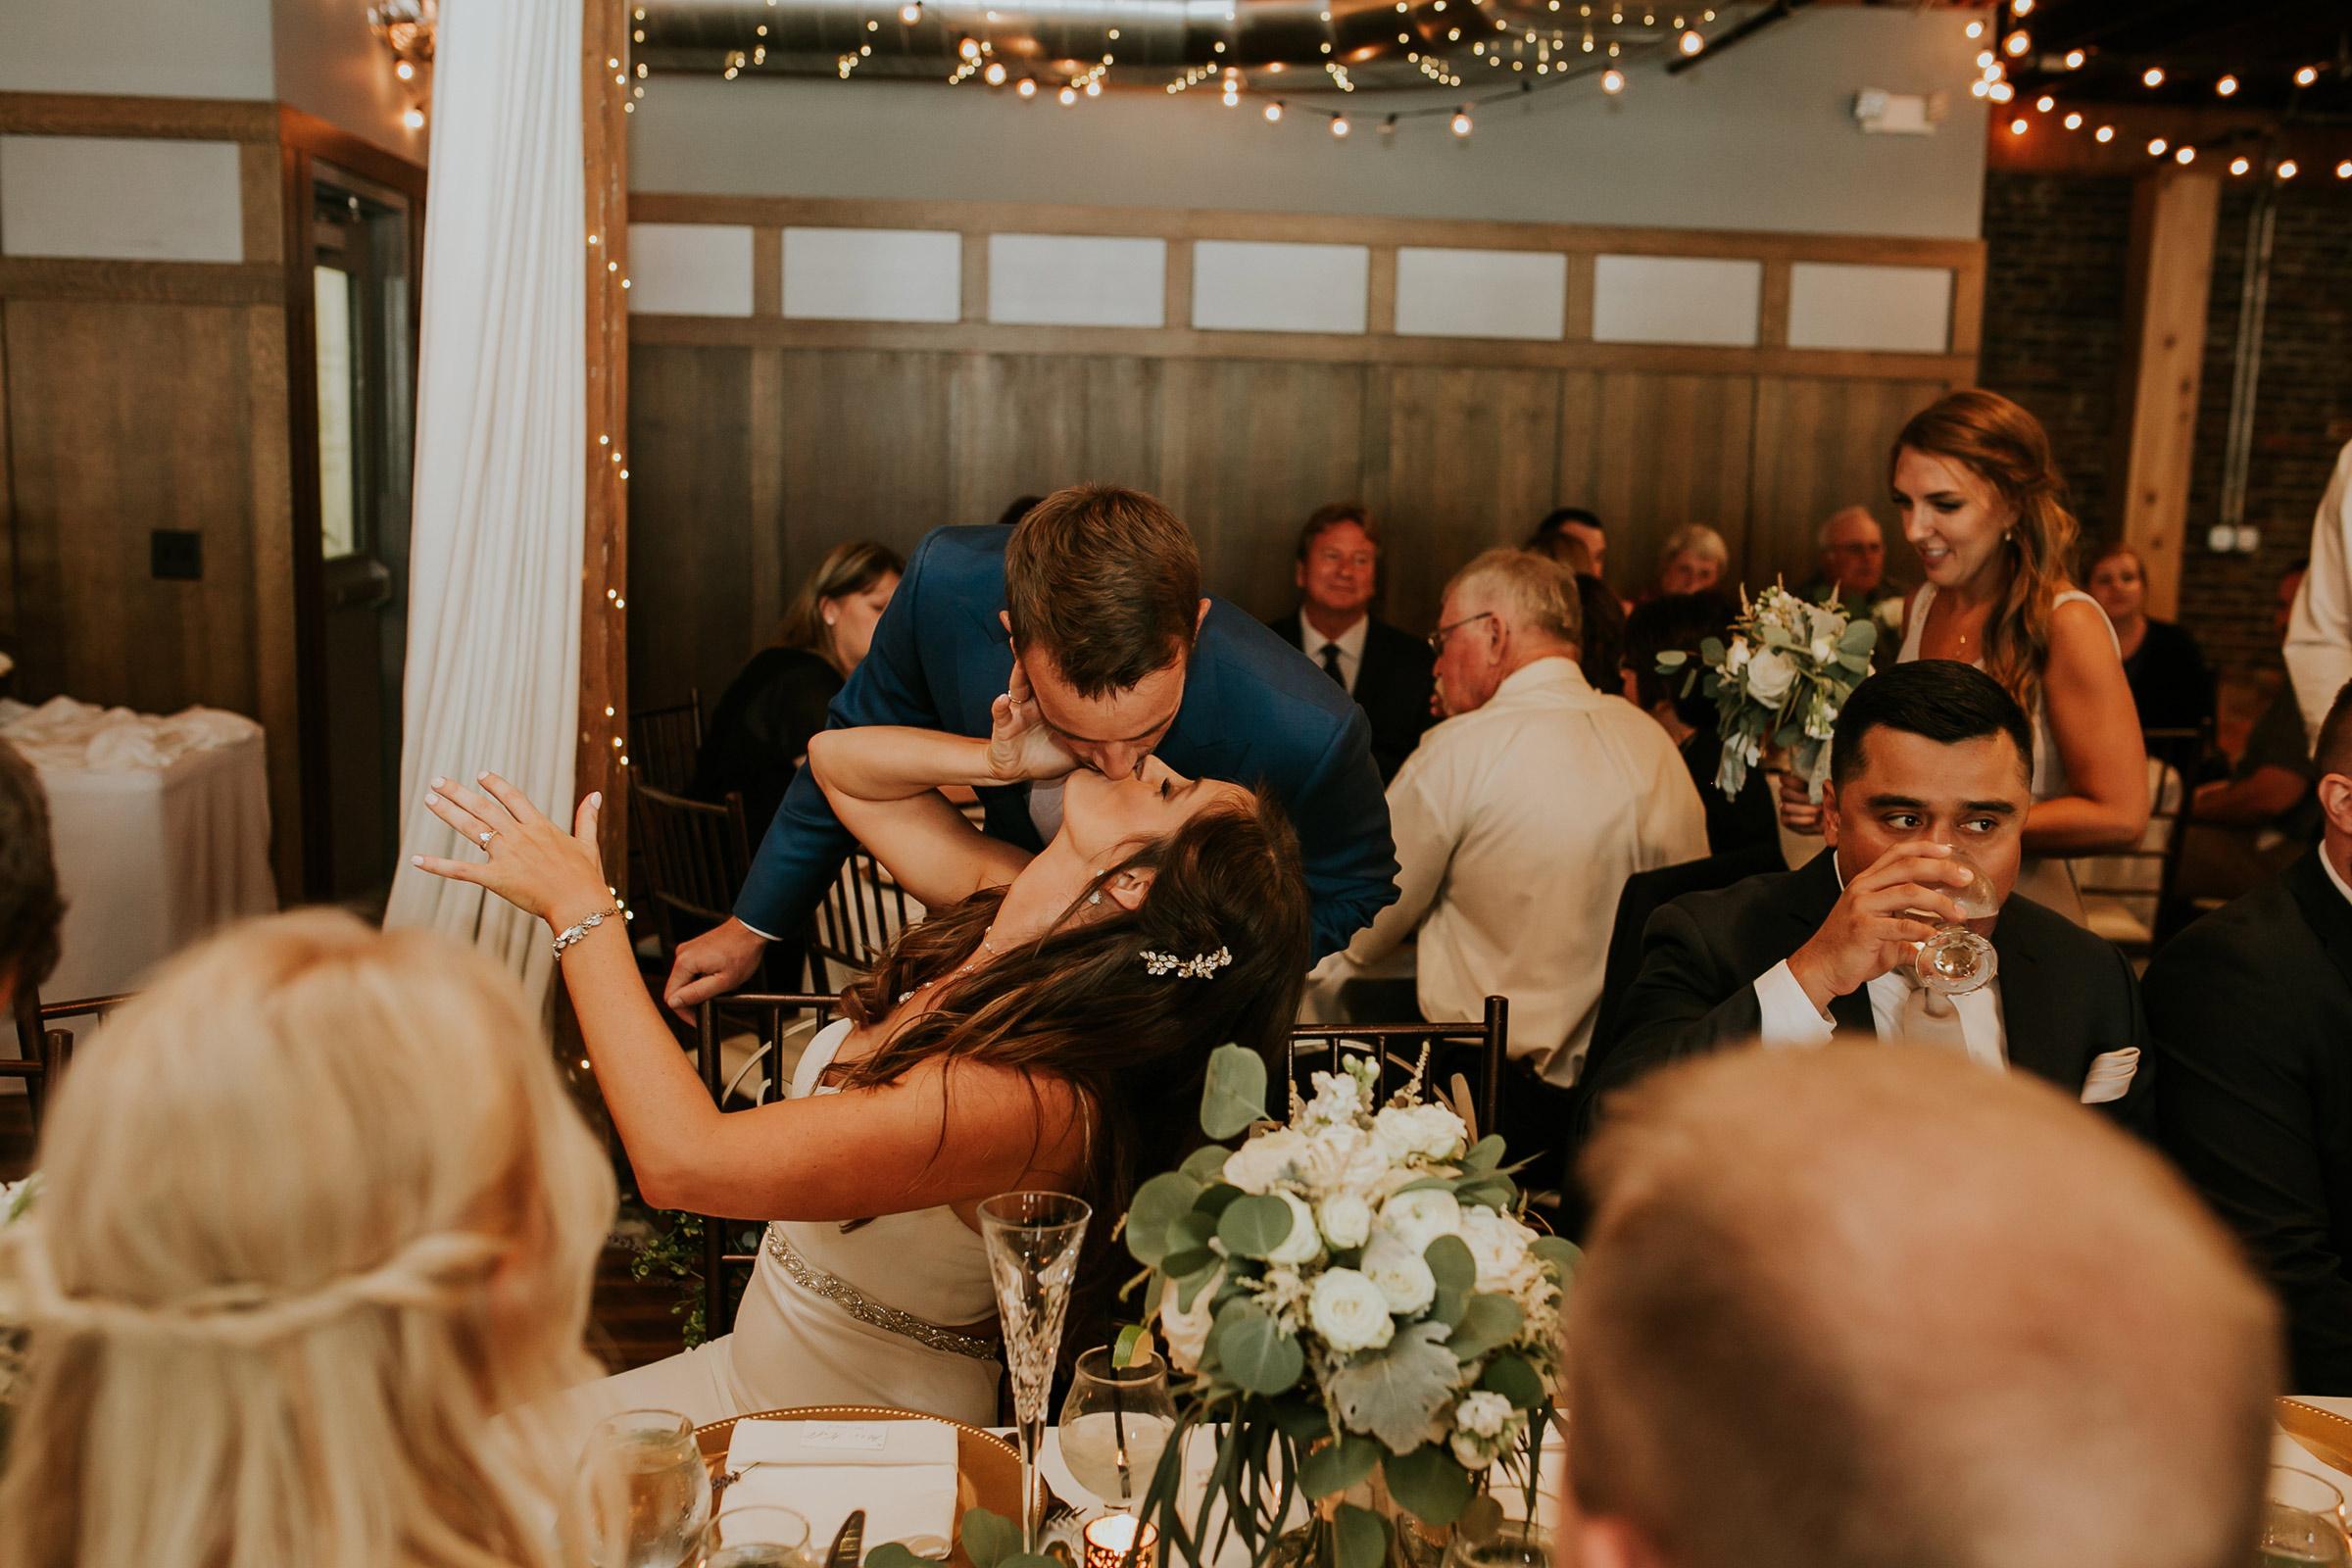 mr-mrs-hull-couple-kissing-reception-taproom-desmoines-iowa-raelyn-ramey-photography-546.jpg